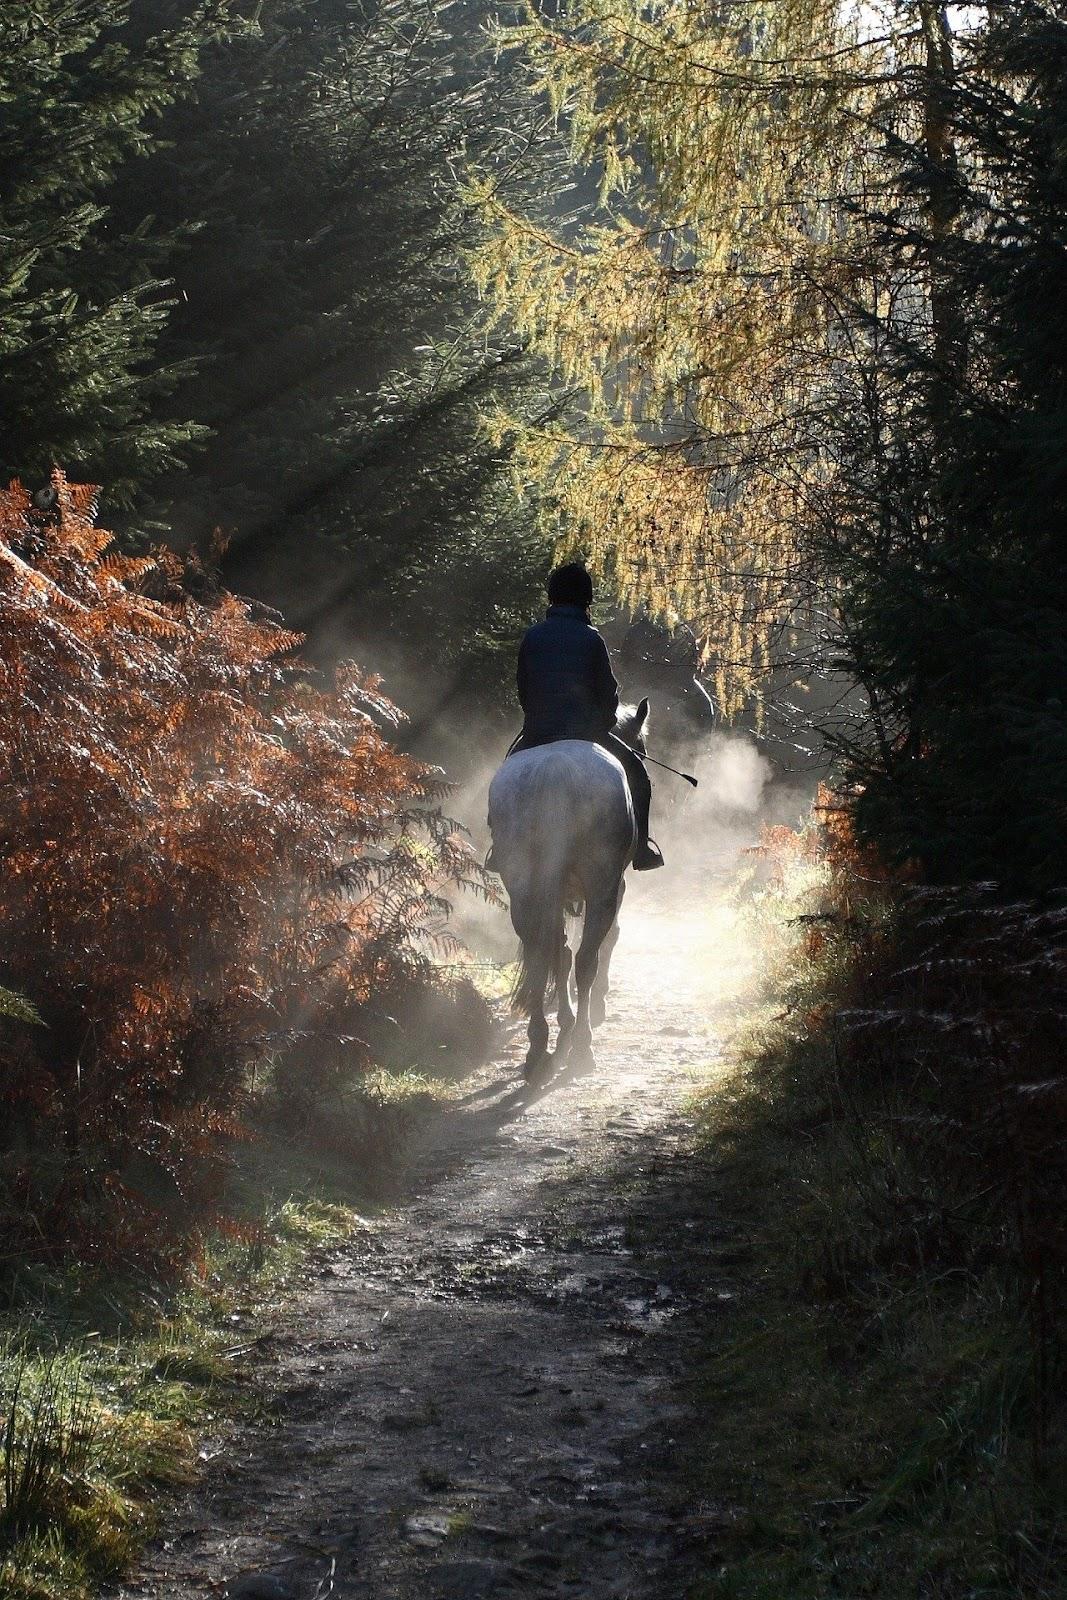 horseback riding through a nature trail